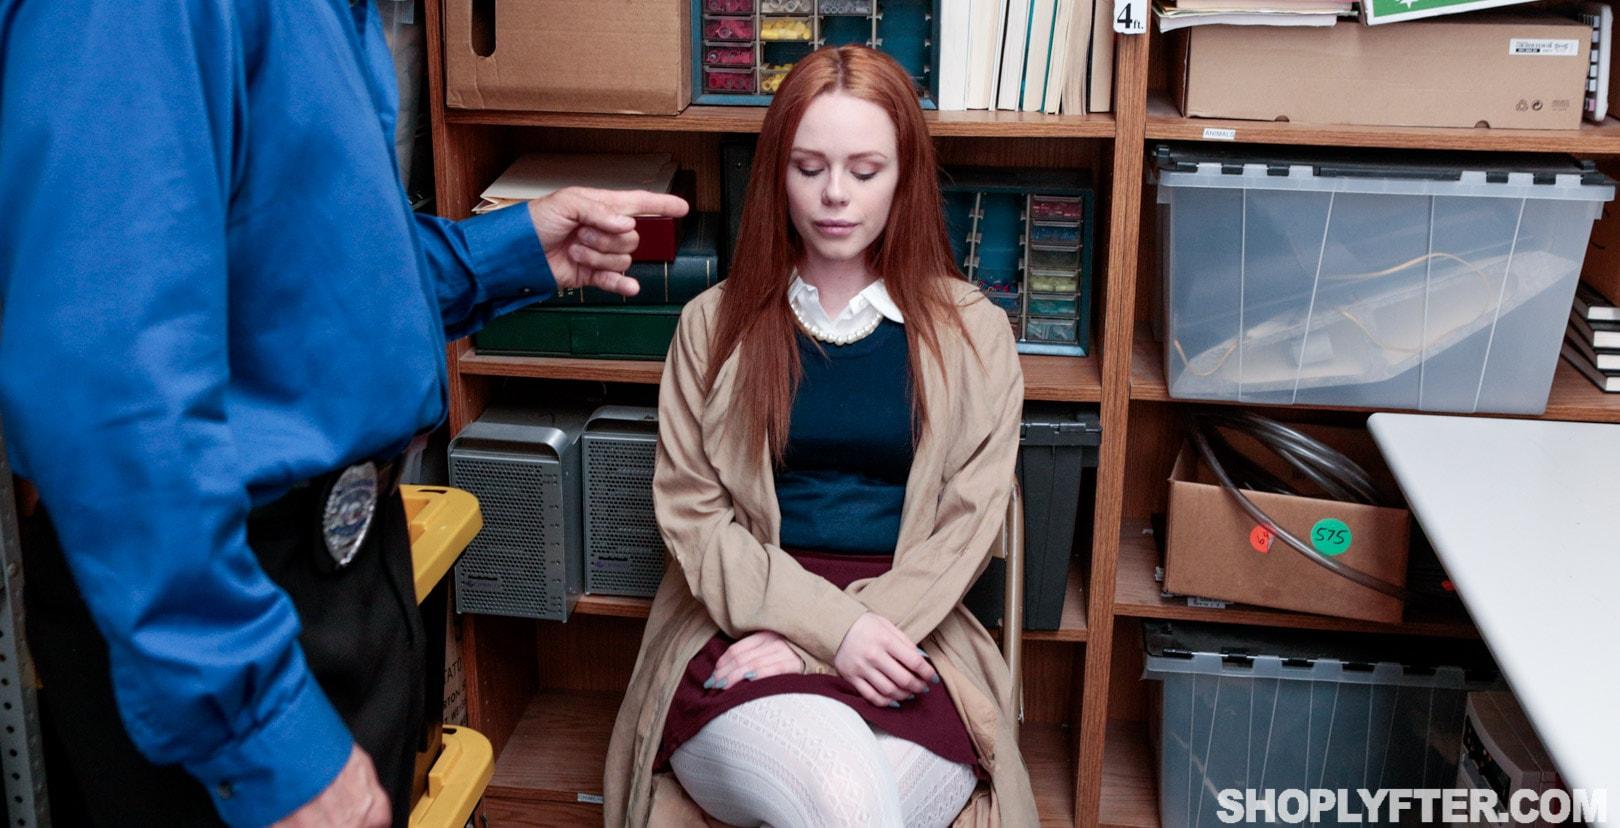 Team Skeet 'Case No. 5144158' starring Ella Hughes (Photo 3)